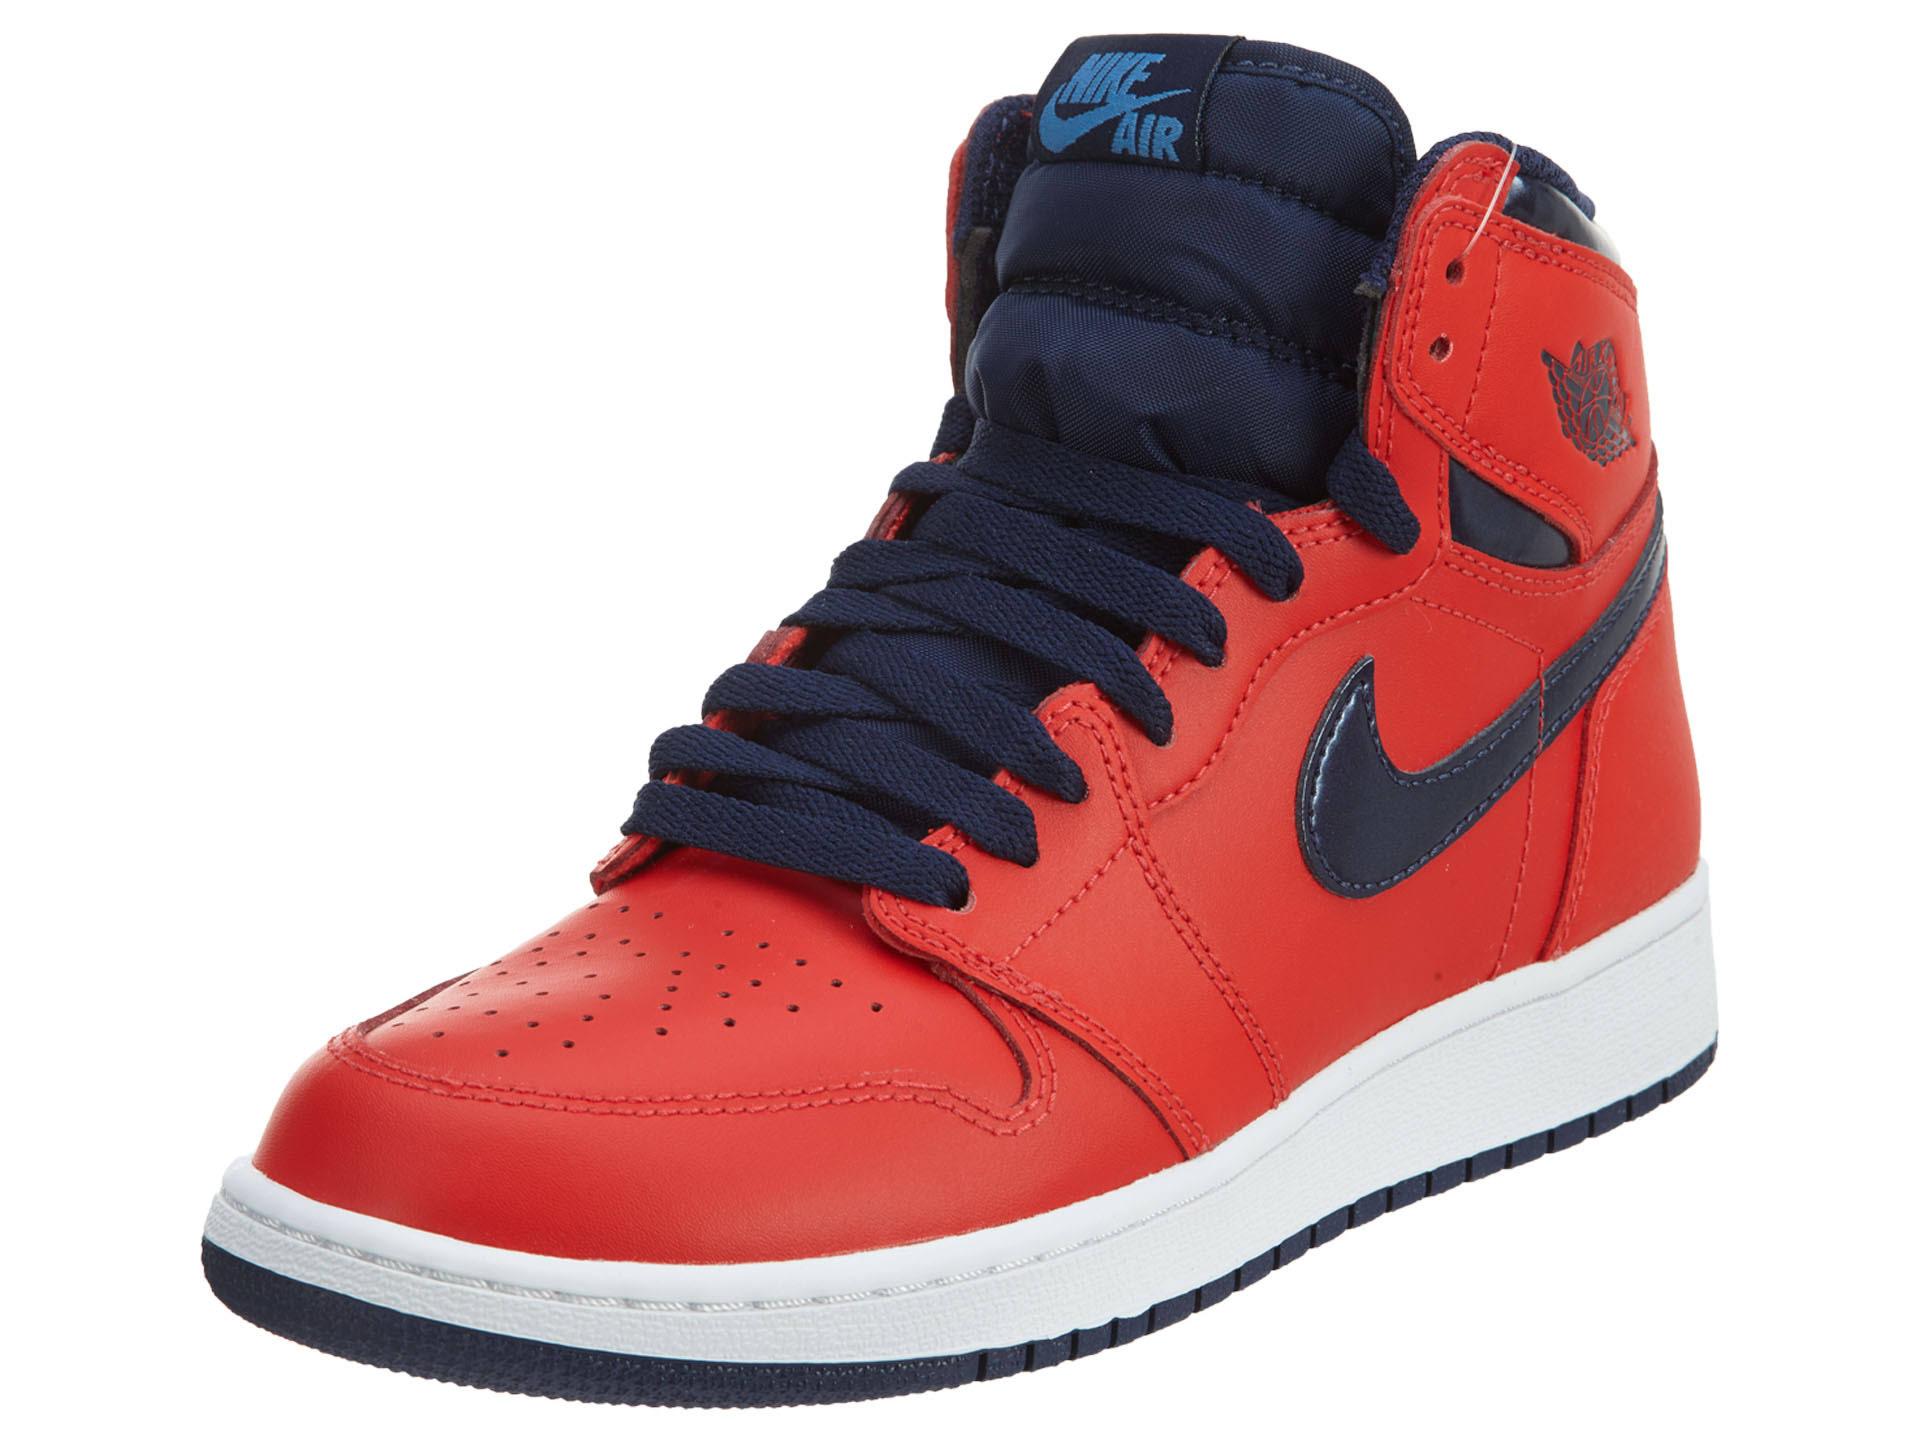 Sneakers Retro Jordan Größe 1 4 Air Bg 'letterman' Jugend 0 EqpOw4nY